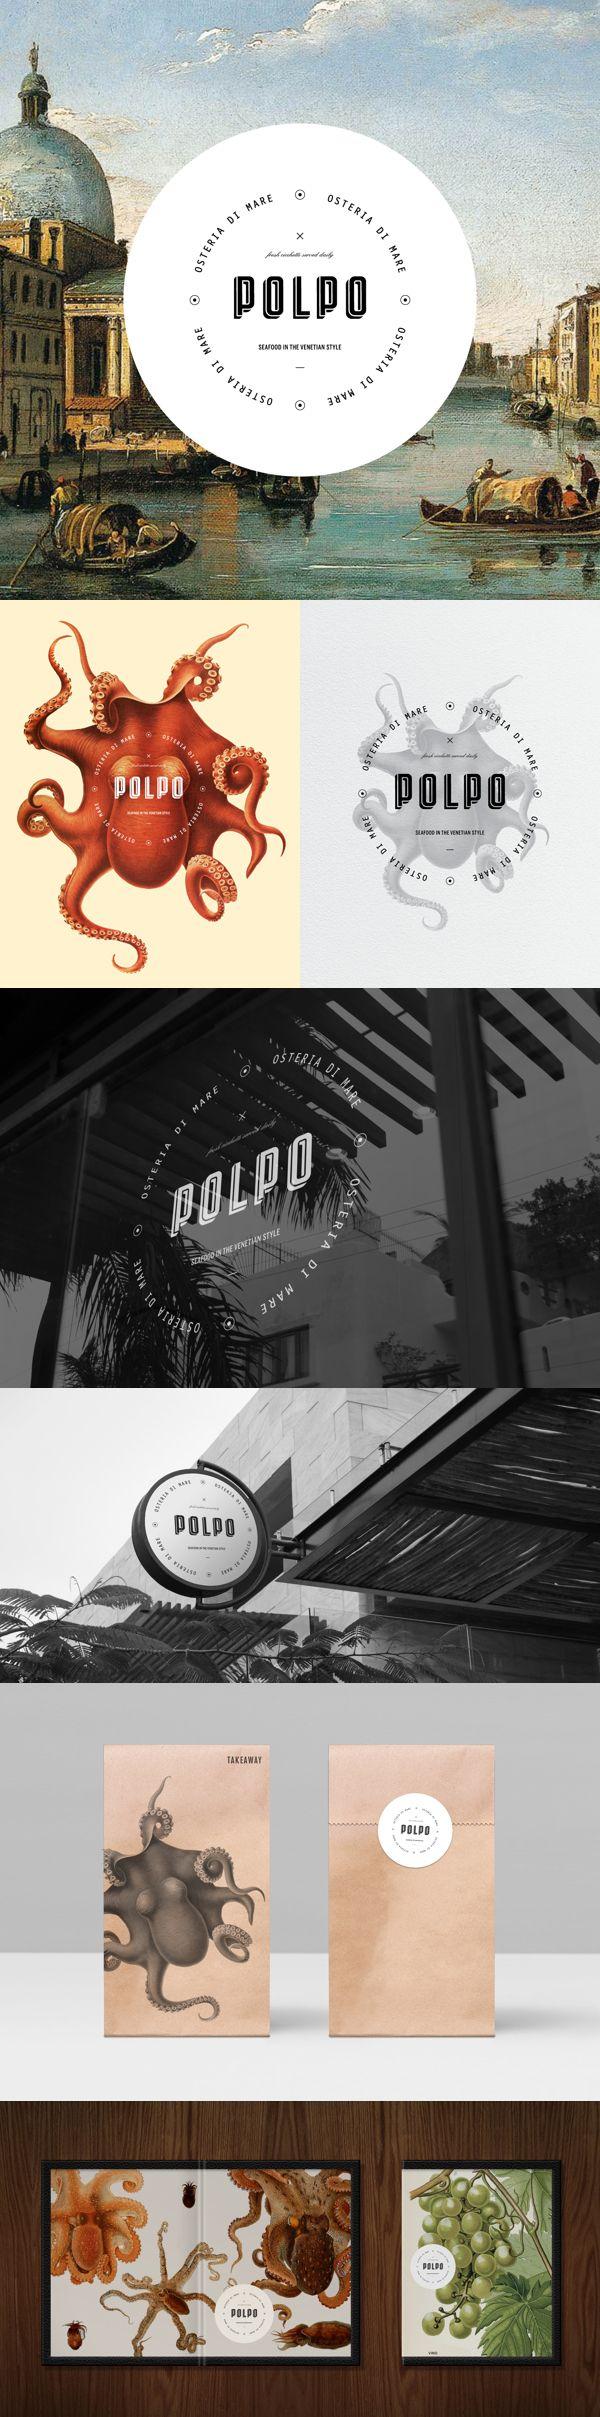 identity / Polpo Restaurant